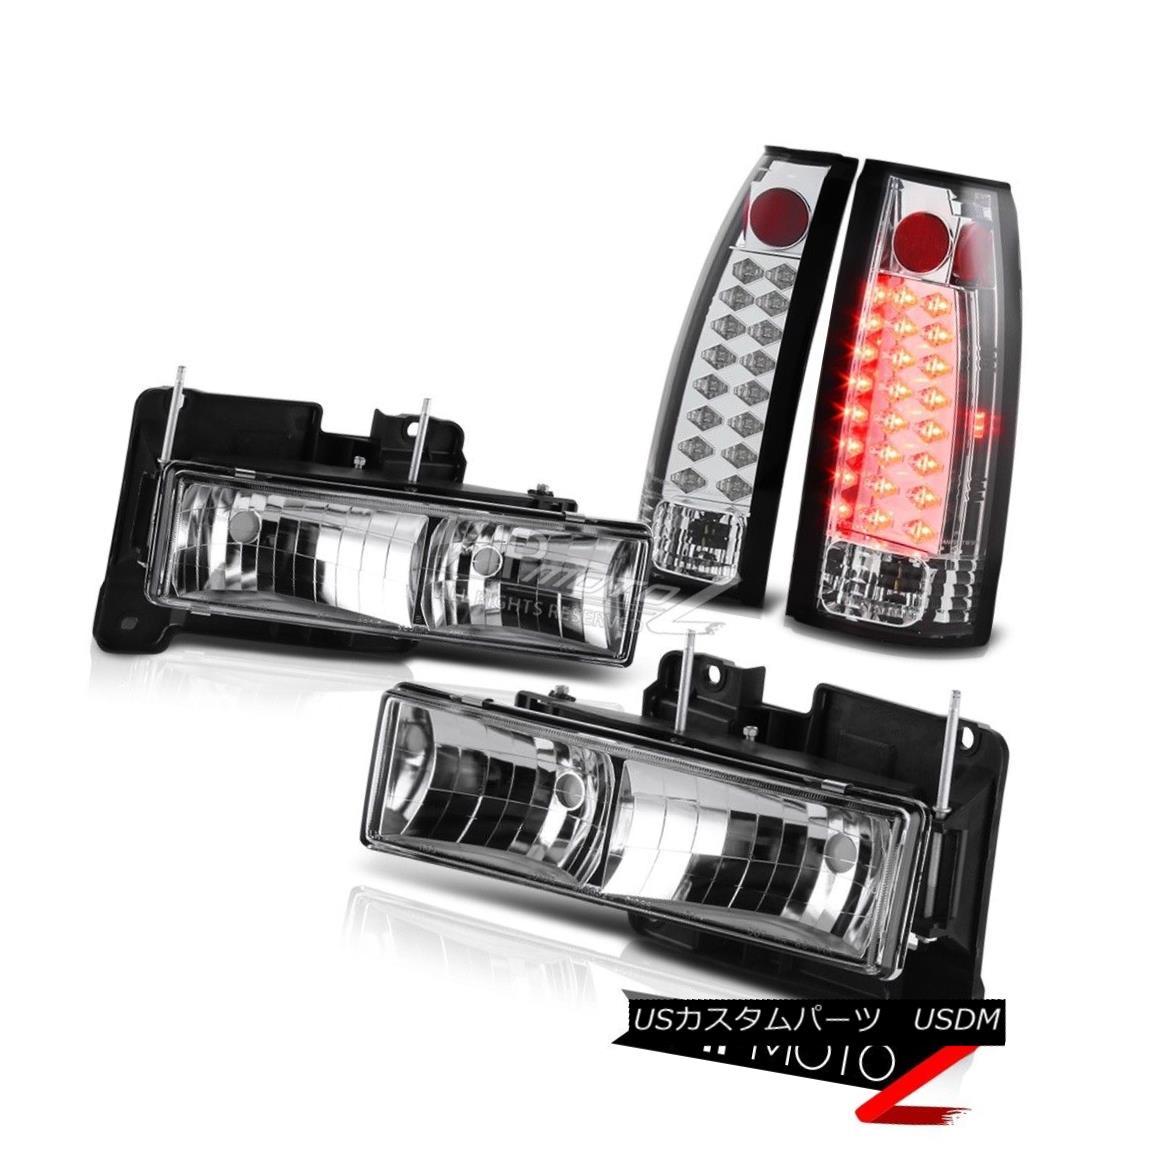 1994-1998 Chevy Truck Z71 3RD Brake Lamp Tail Lights Headlamps Signal Parking